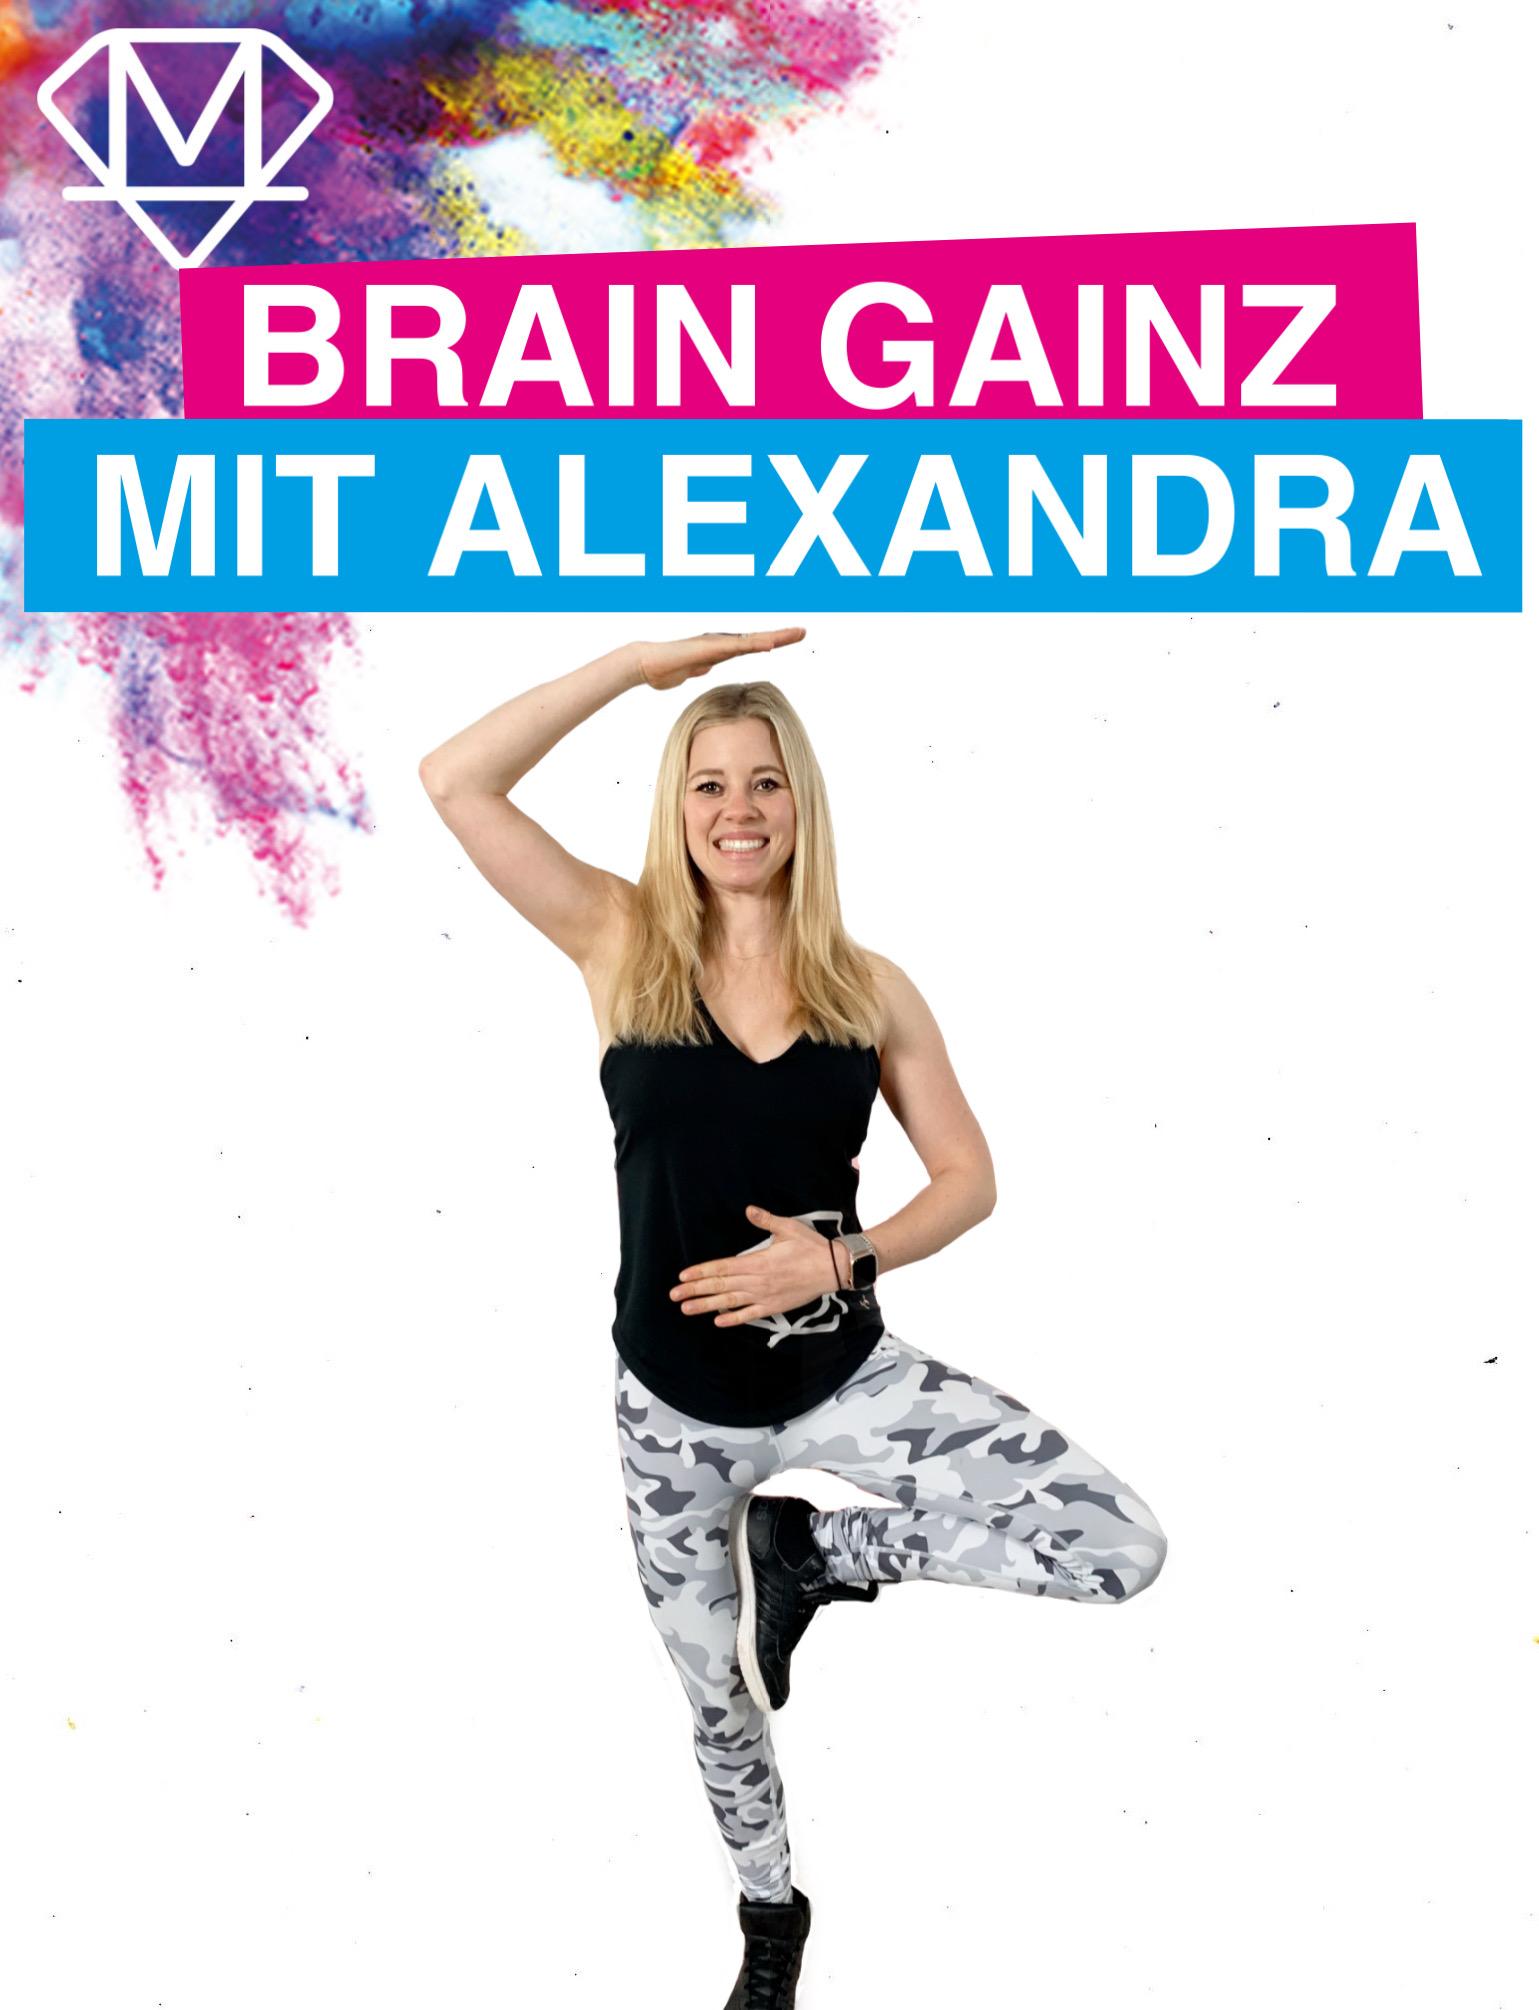 Brain Gainz mit Alexandra